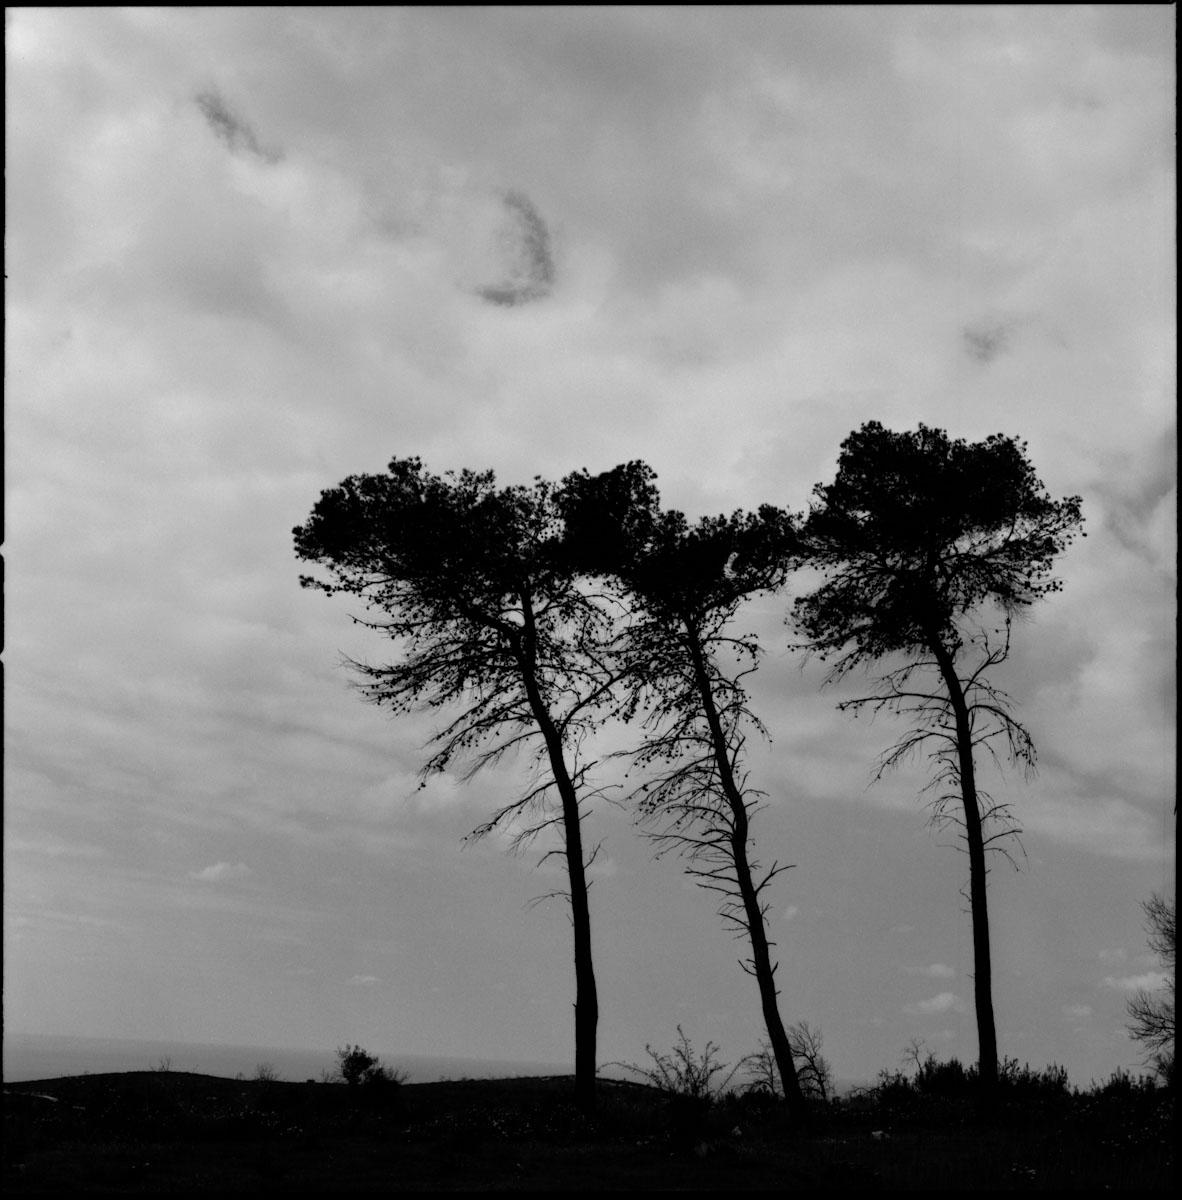 kodak-100tmx-dark_life_of_three_trees_victor_bezrukov.jpg